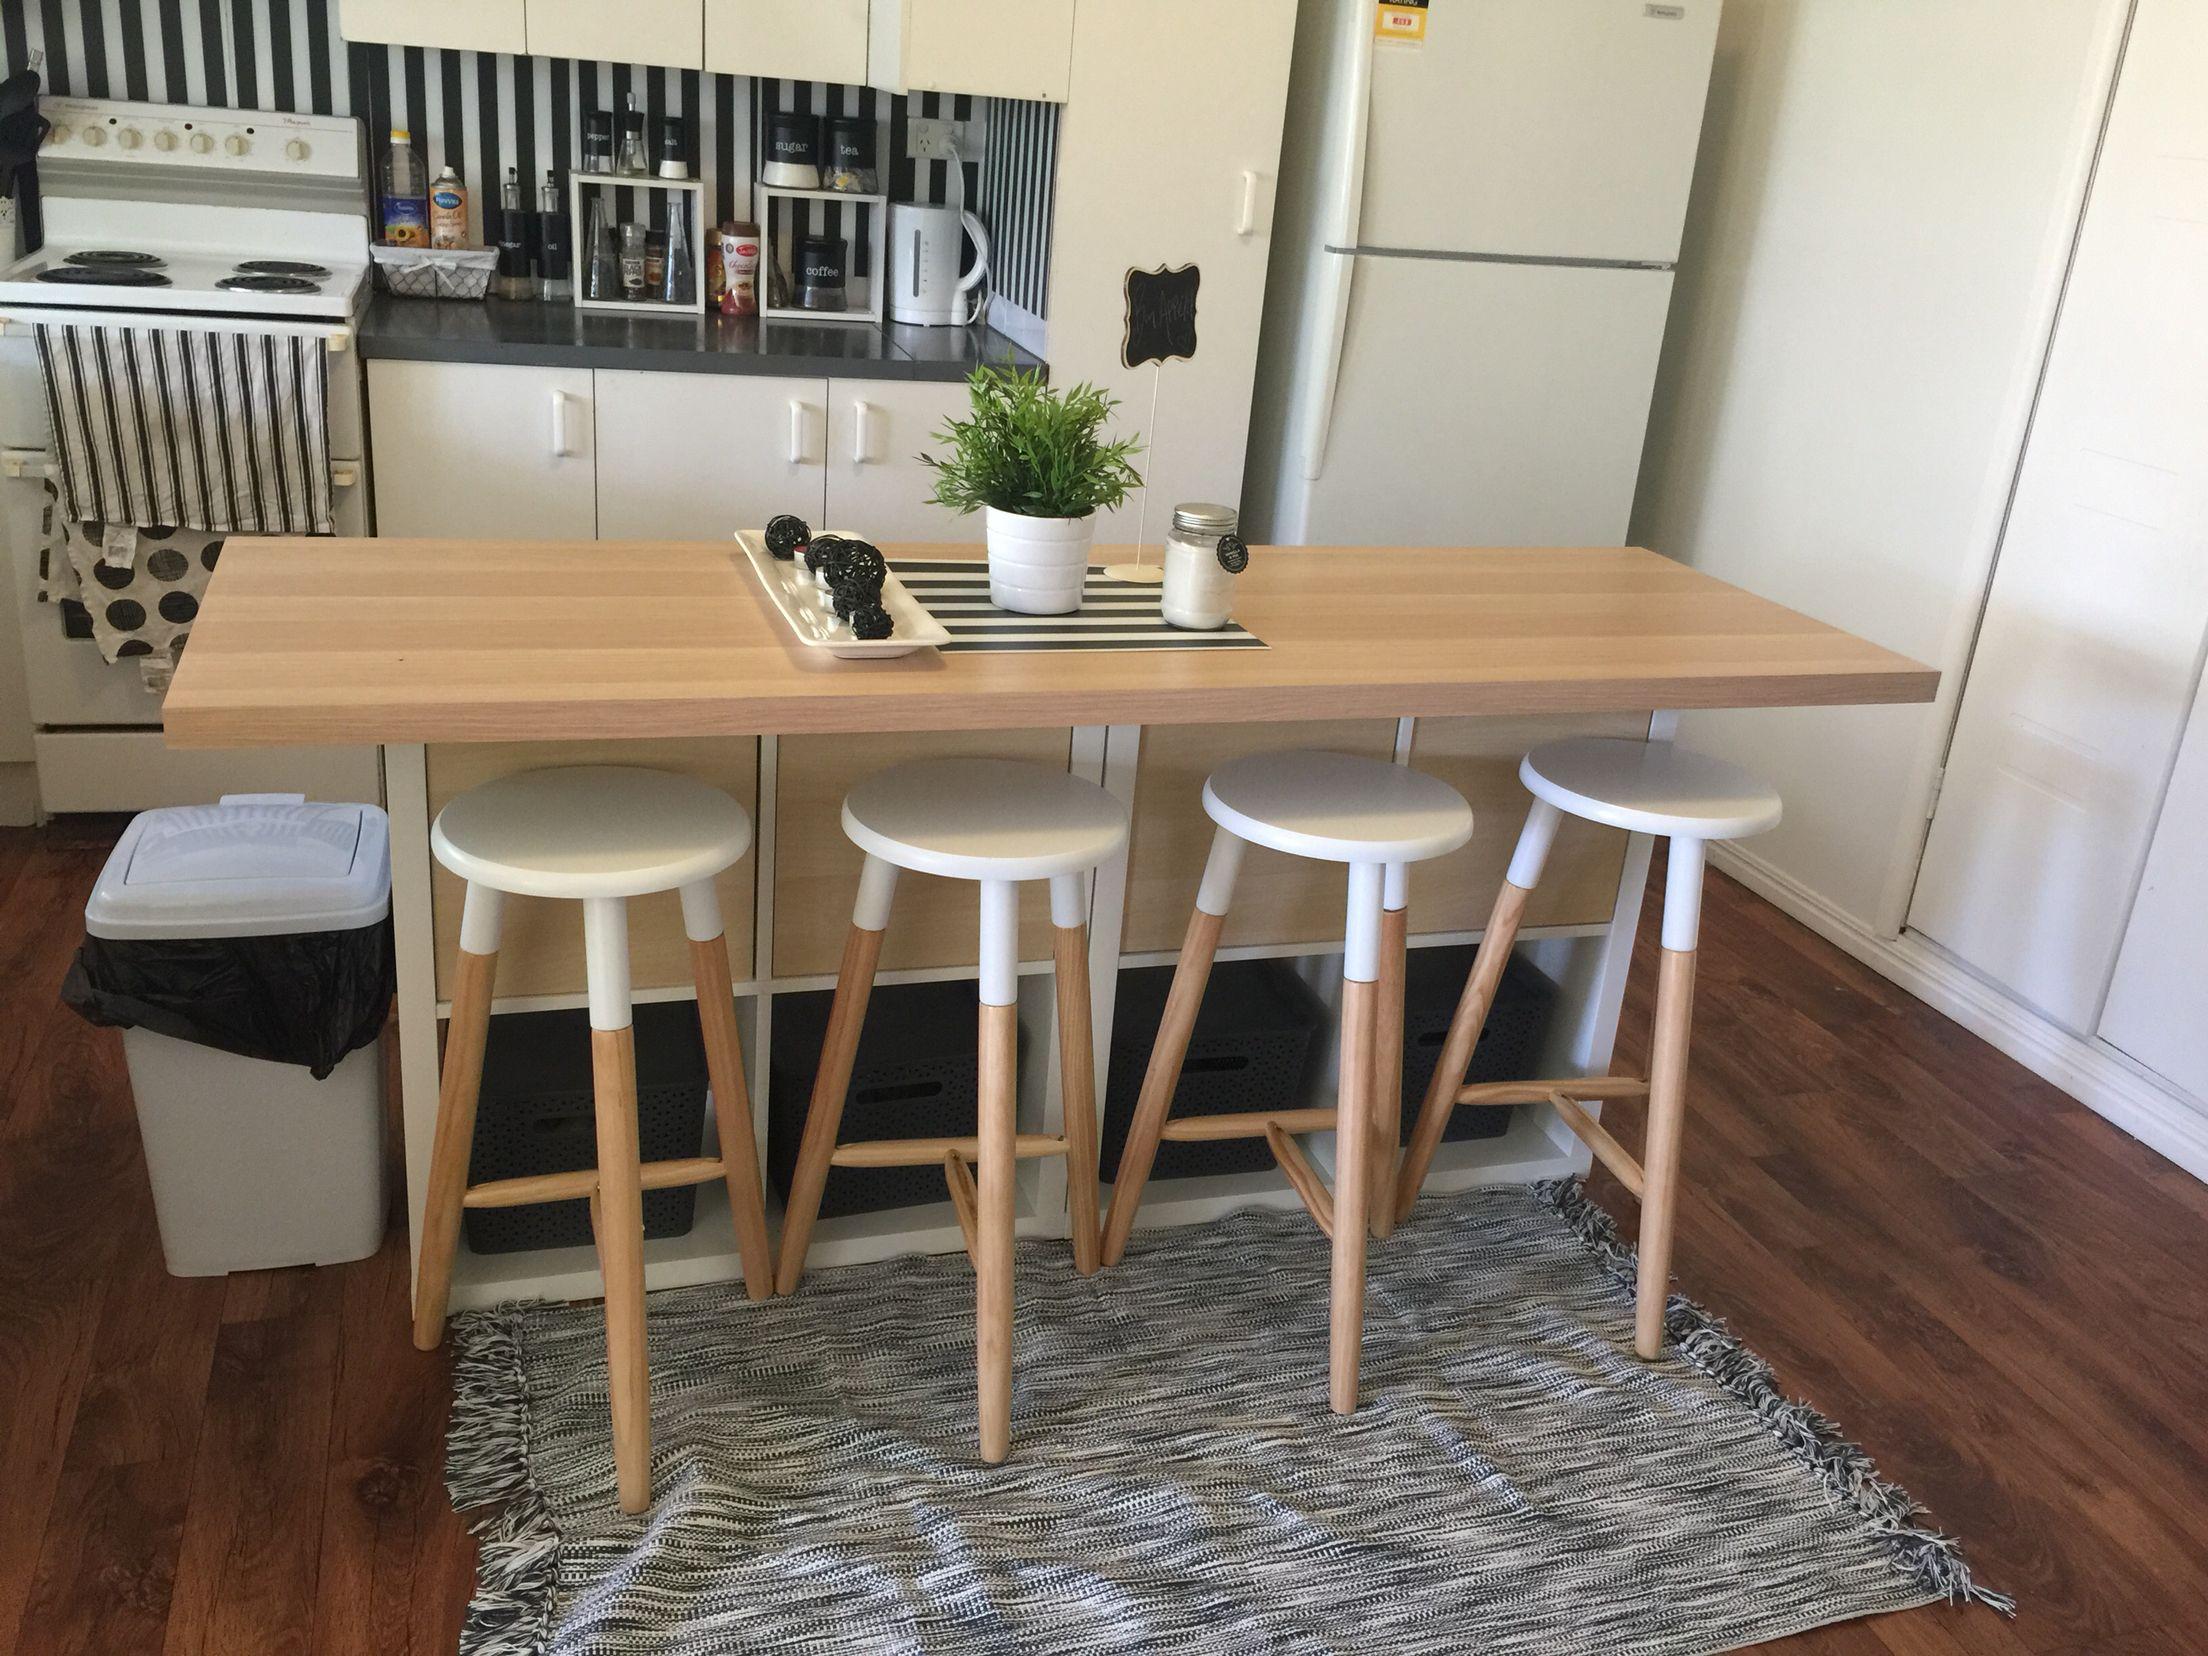 Ideas Kmart Kitchen Table Sets Arminbachmann With Tables